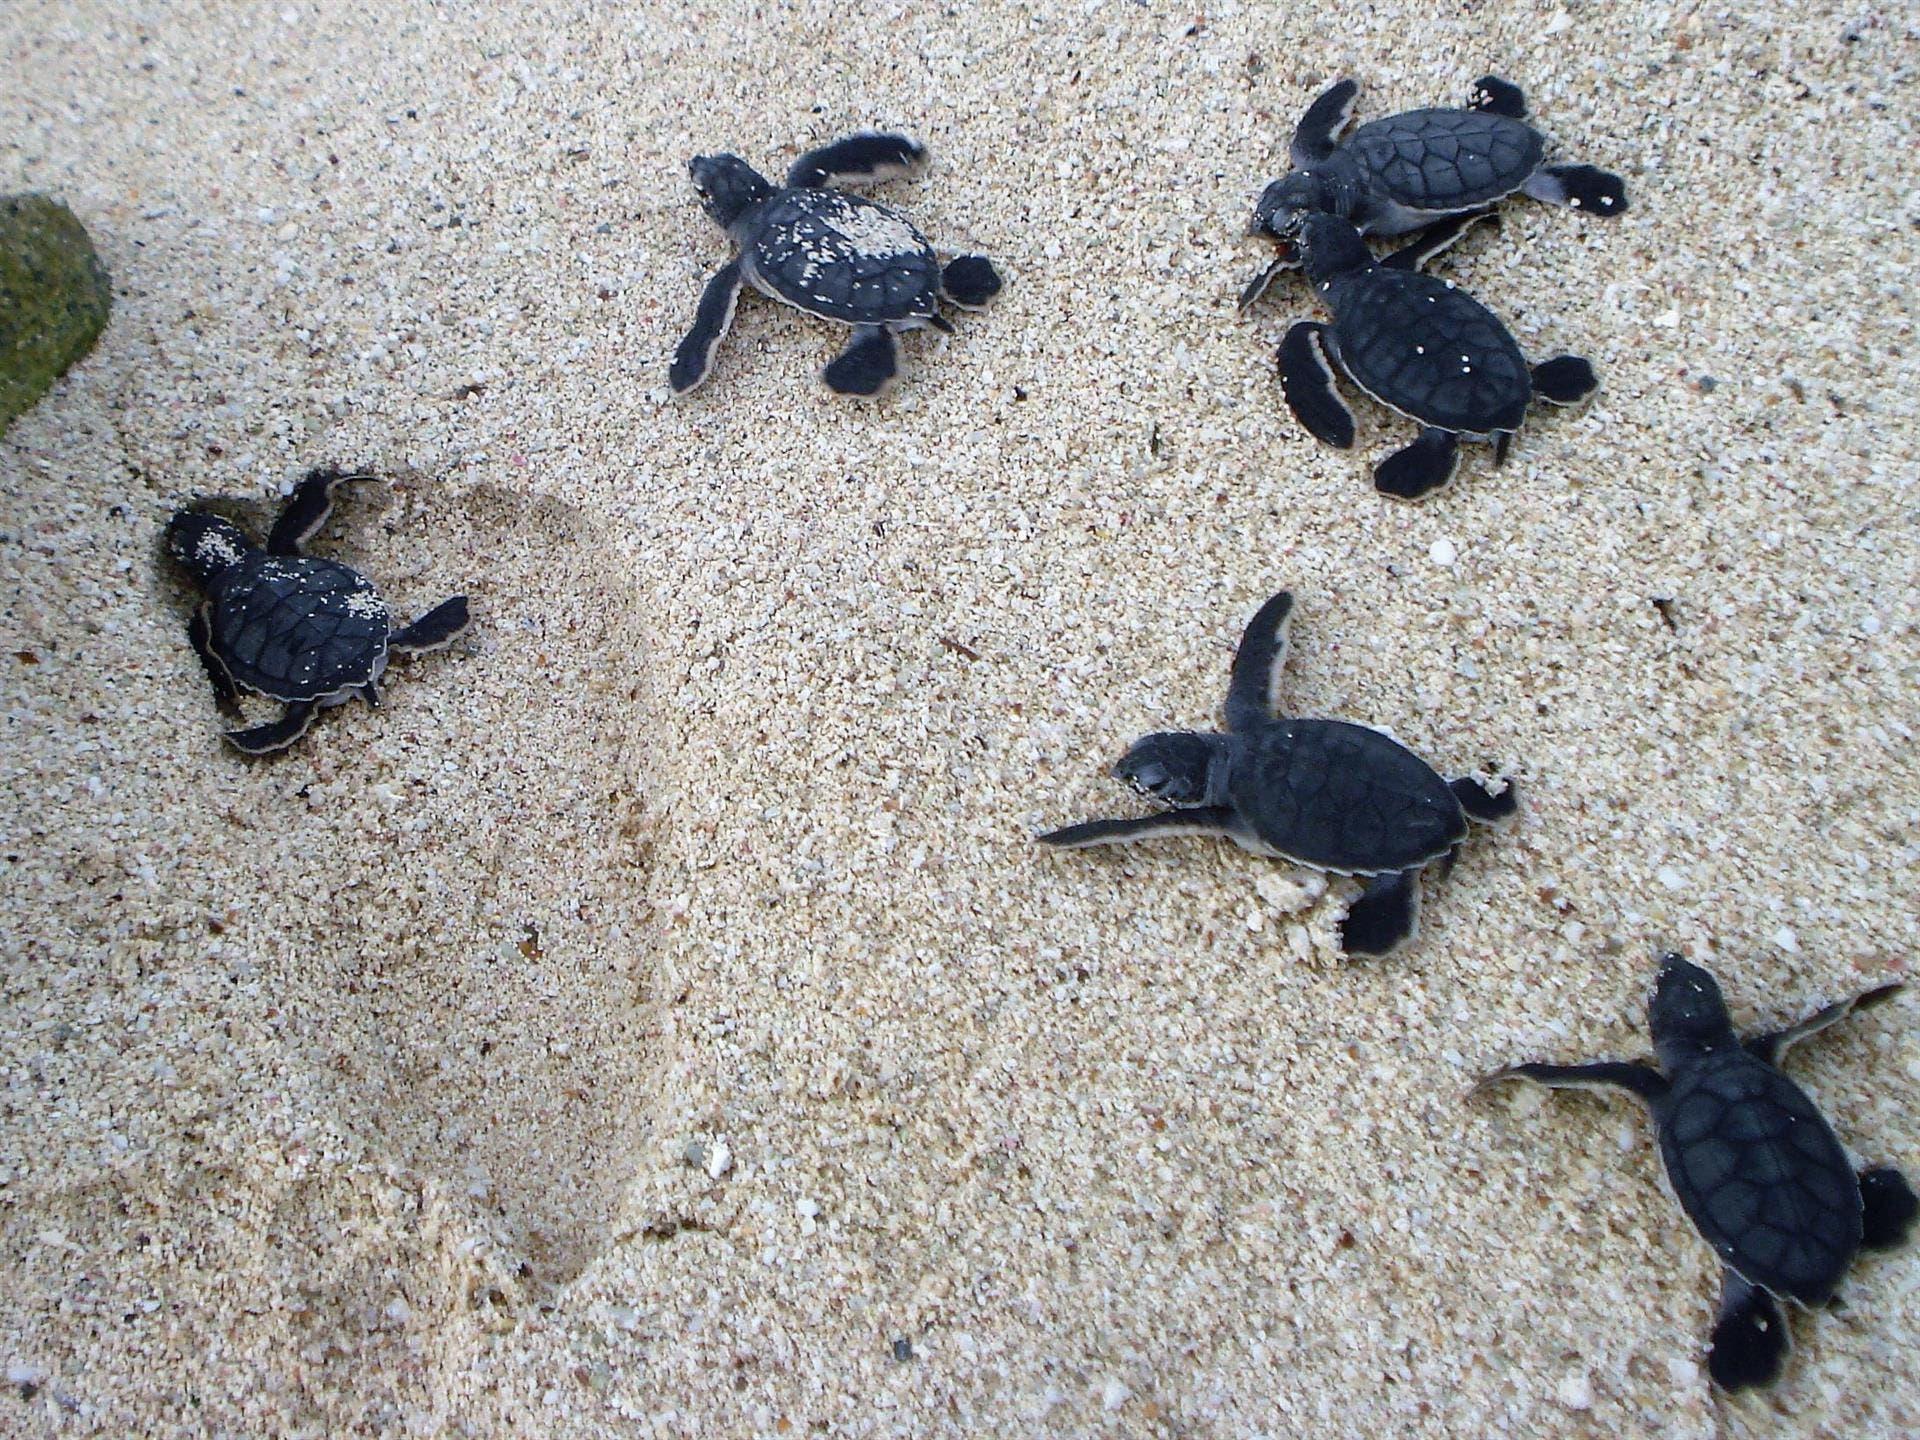 Inician actividades para proteger a la tortuga marina en Puerto Morelos